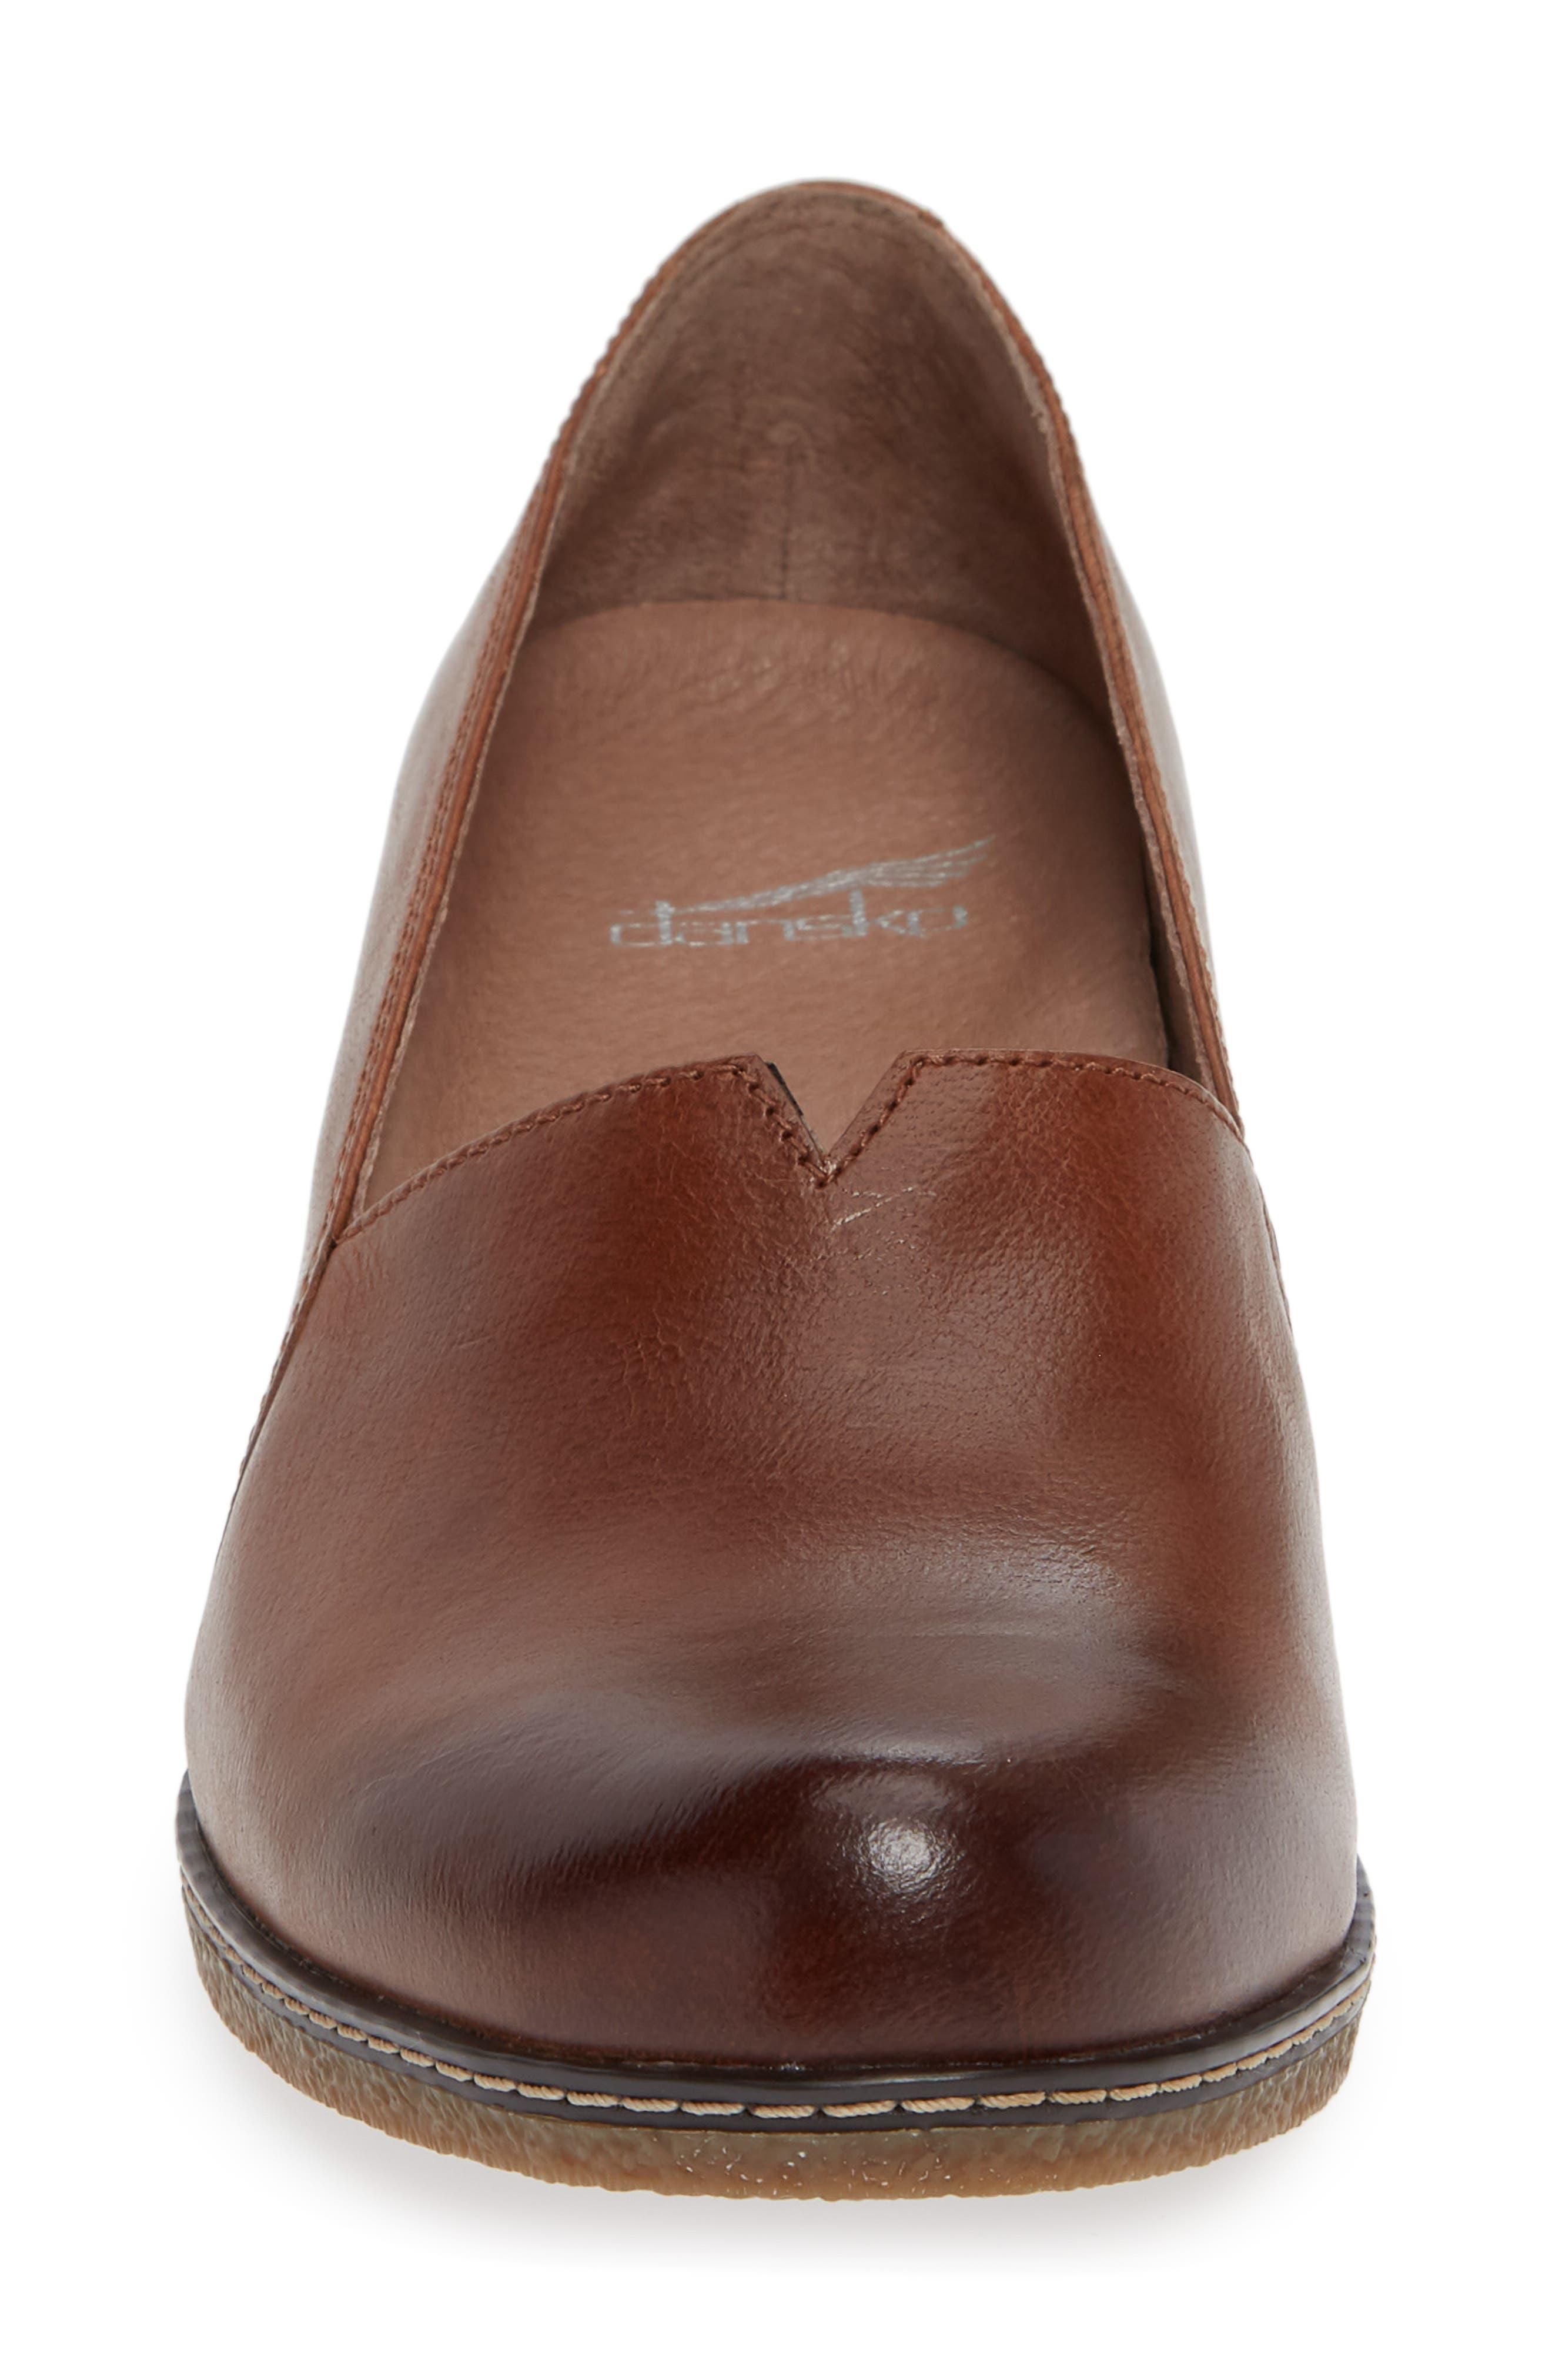 Liliana Concealed Wedge Slip-On,                             Alternate thumbnail 4, color,                             Chestnut Burnished Leather